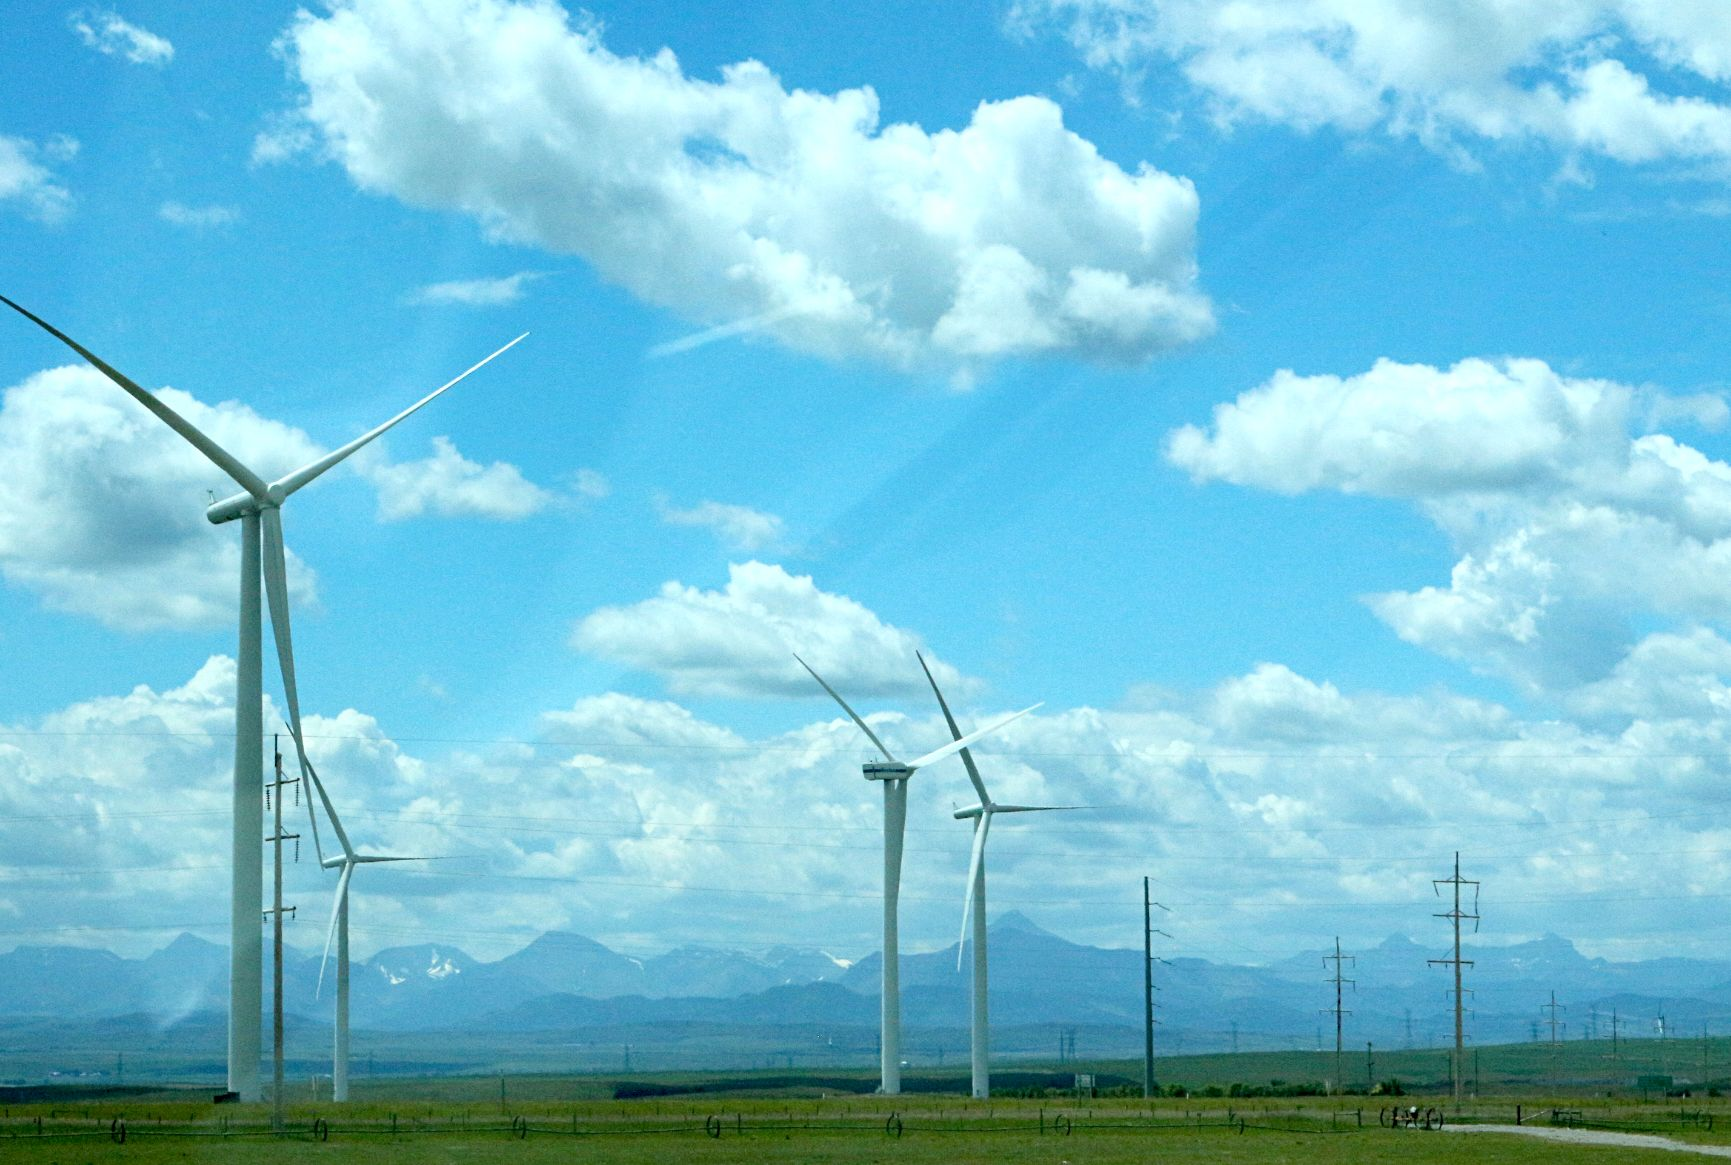 My Ambit Energy Alberta, Canada; Japan; USA Energy